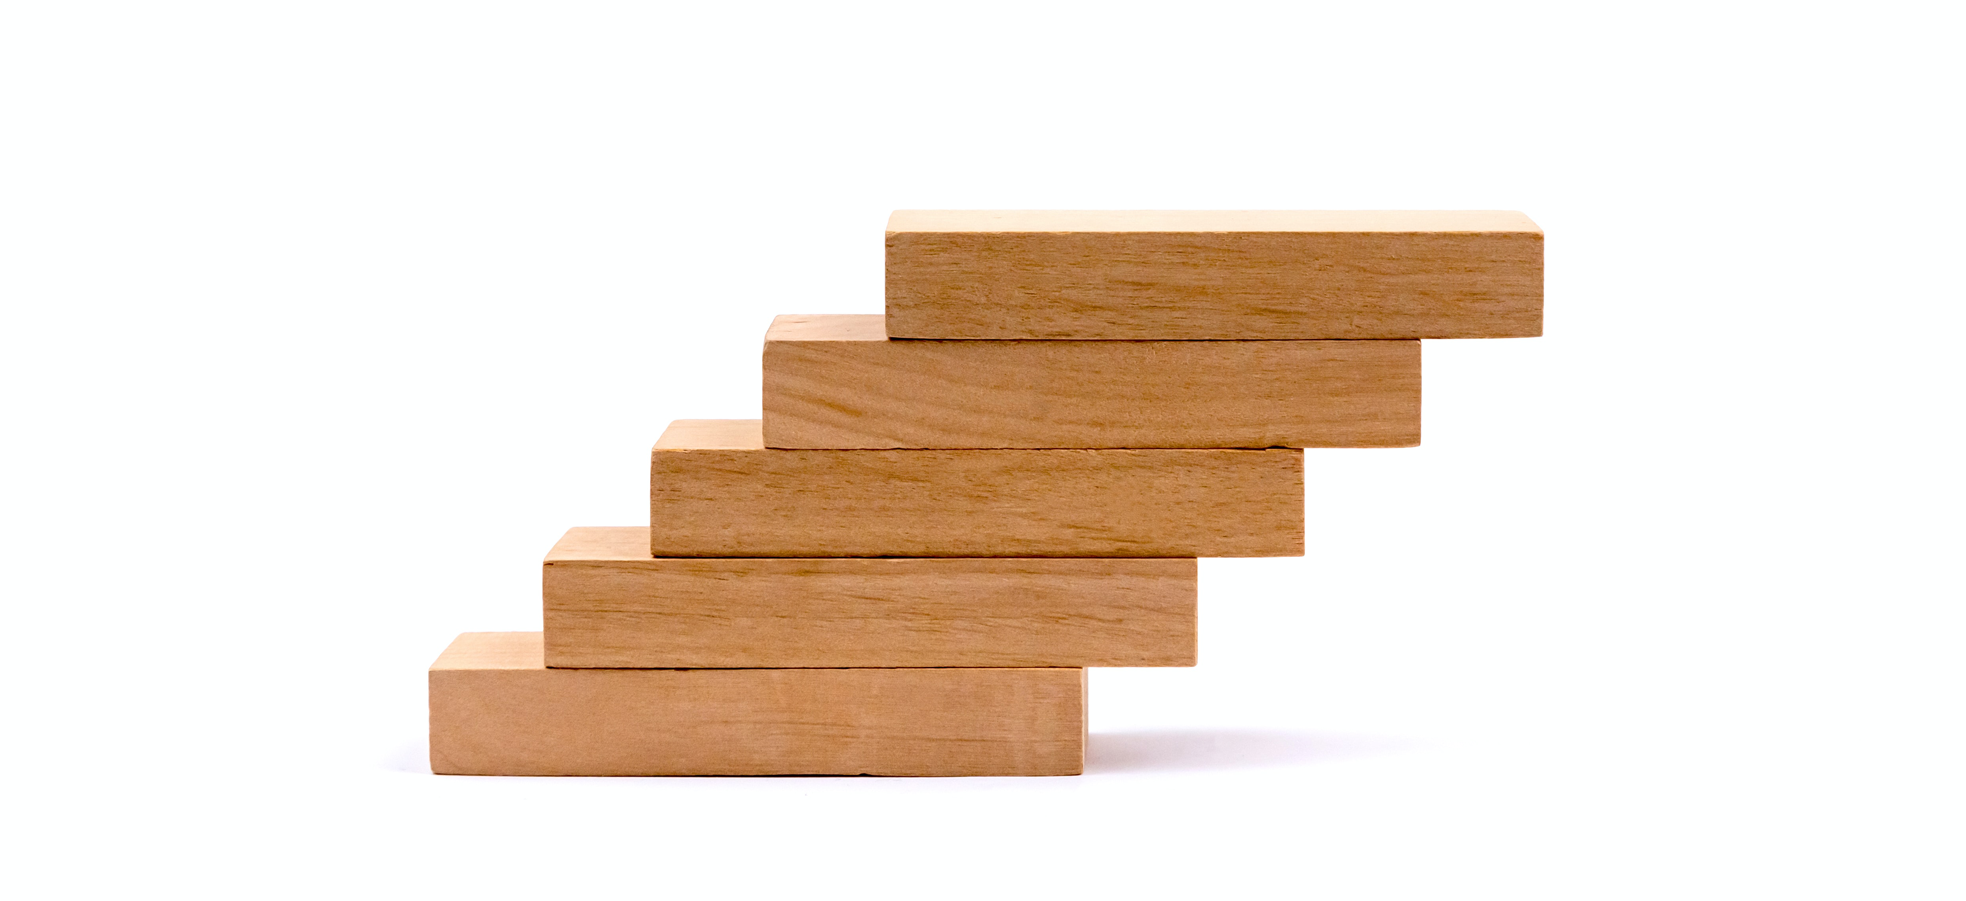 Blocks balancing